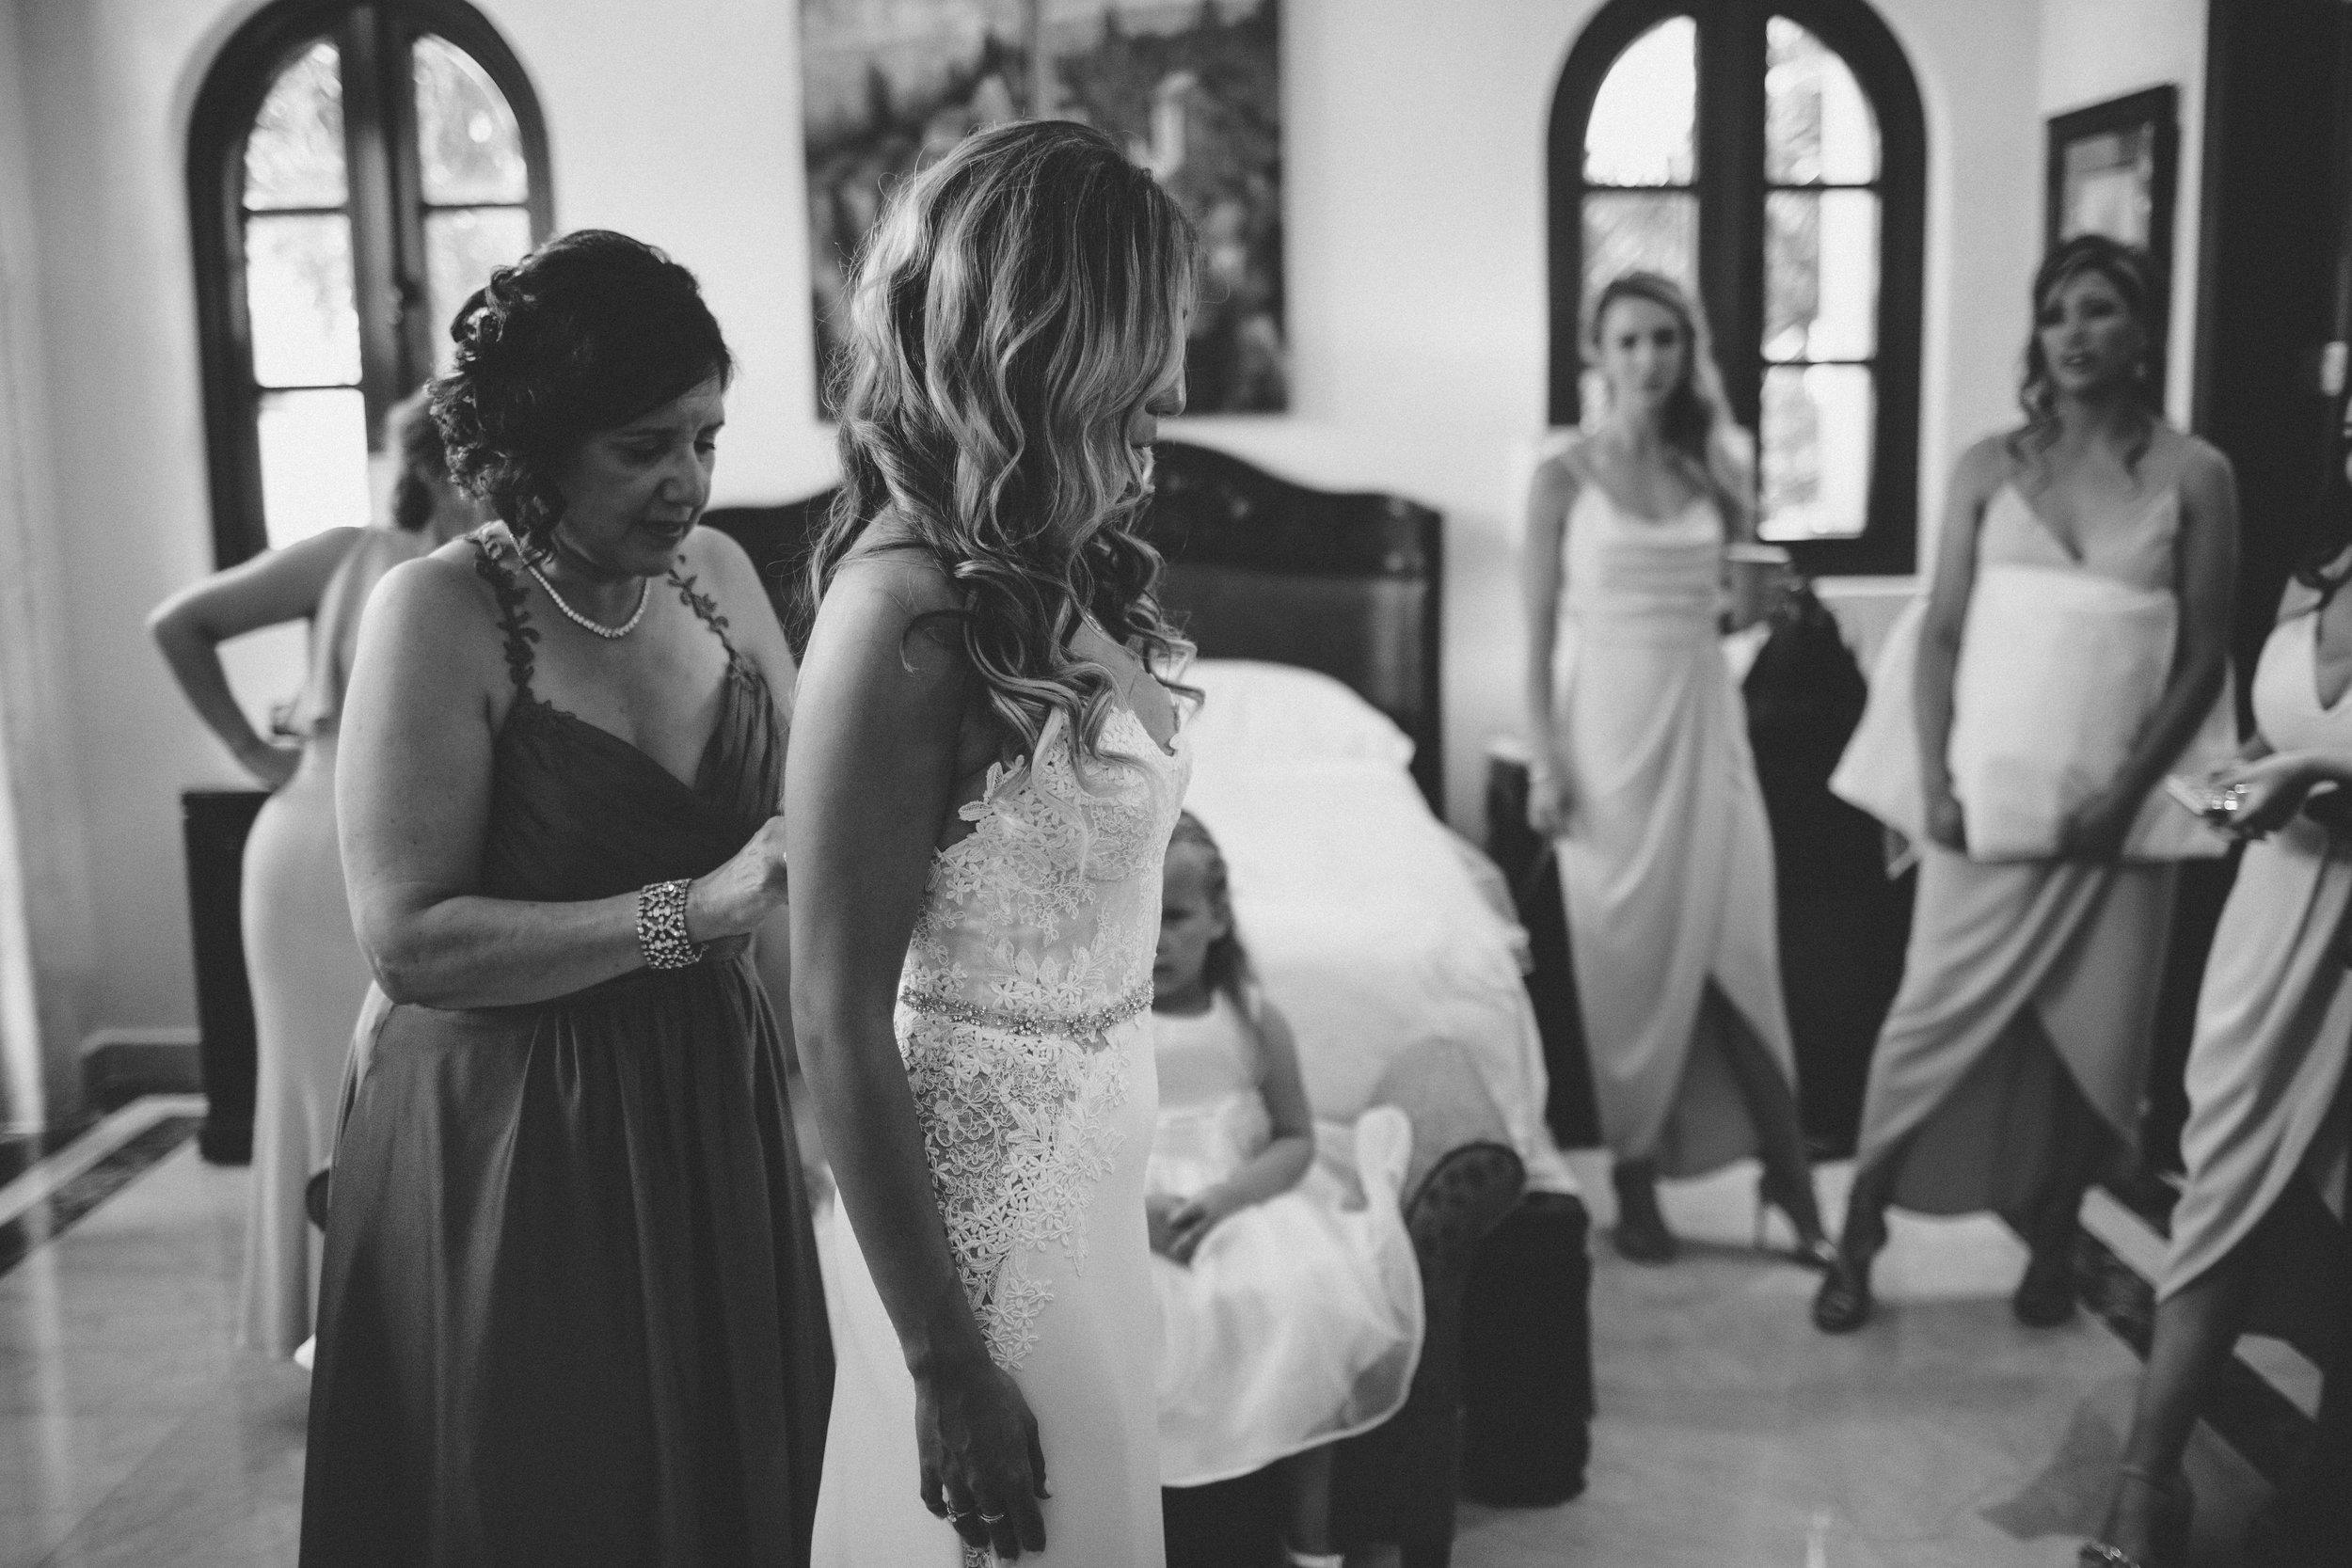 mexico_wedding_cancun_villa_la_joya_evangeline_lane_026a.jpg